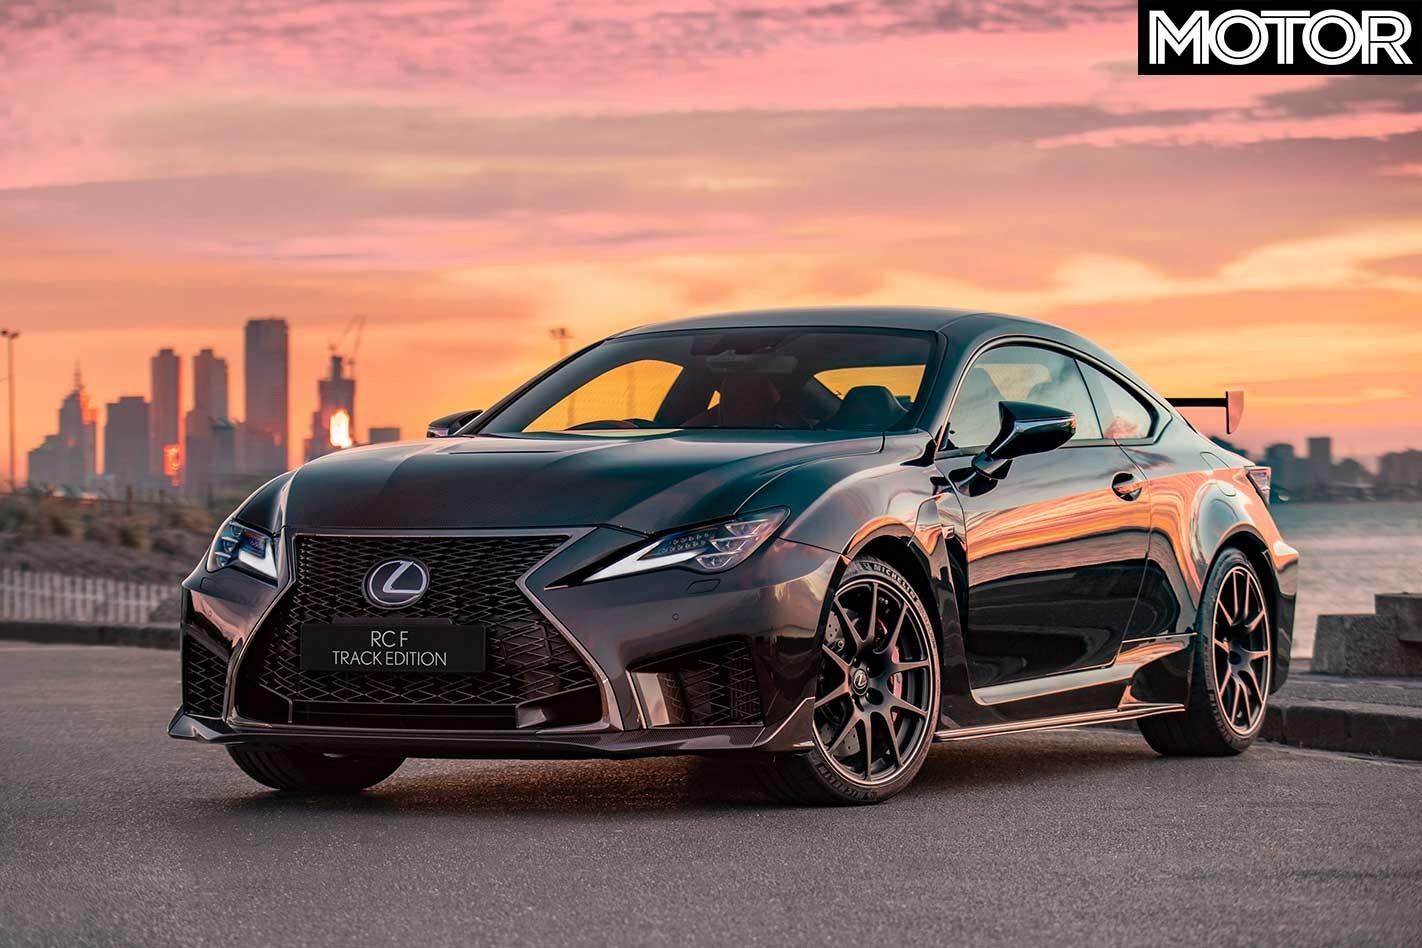 2019 Lexus RC F Track Edition Front Jpg